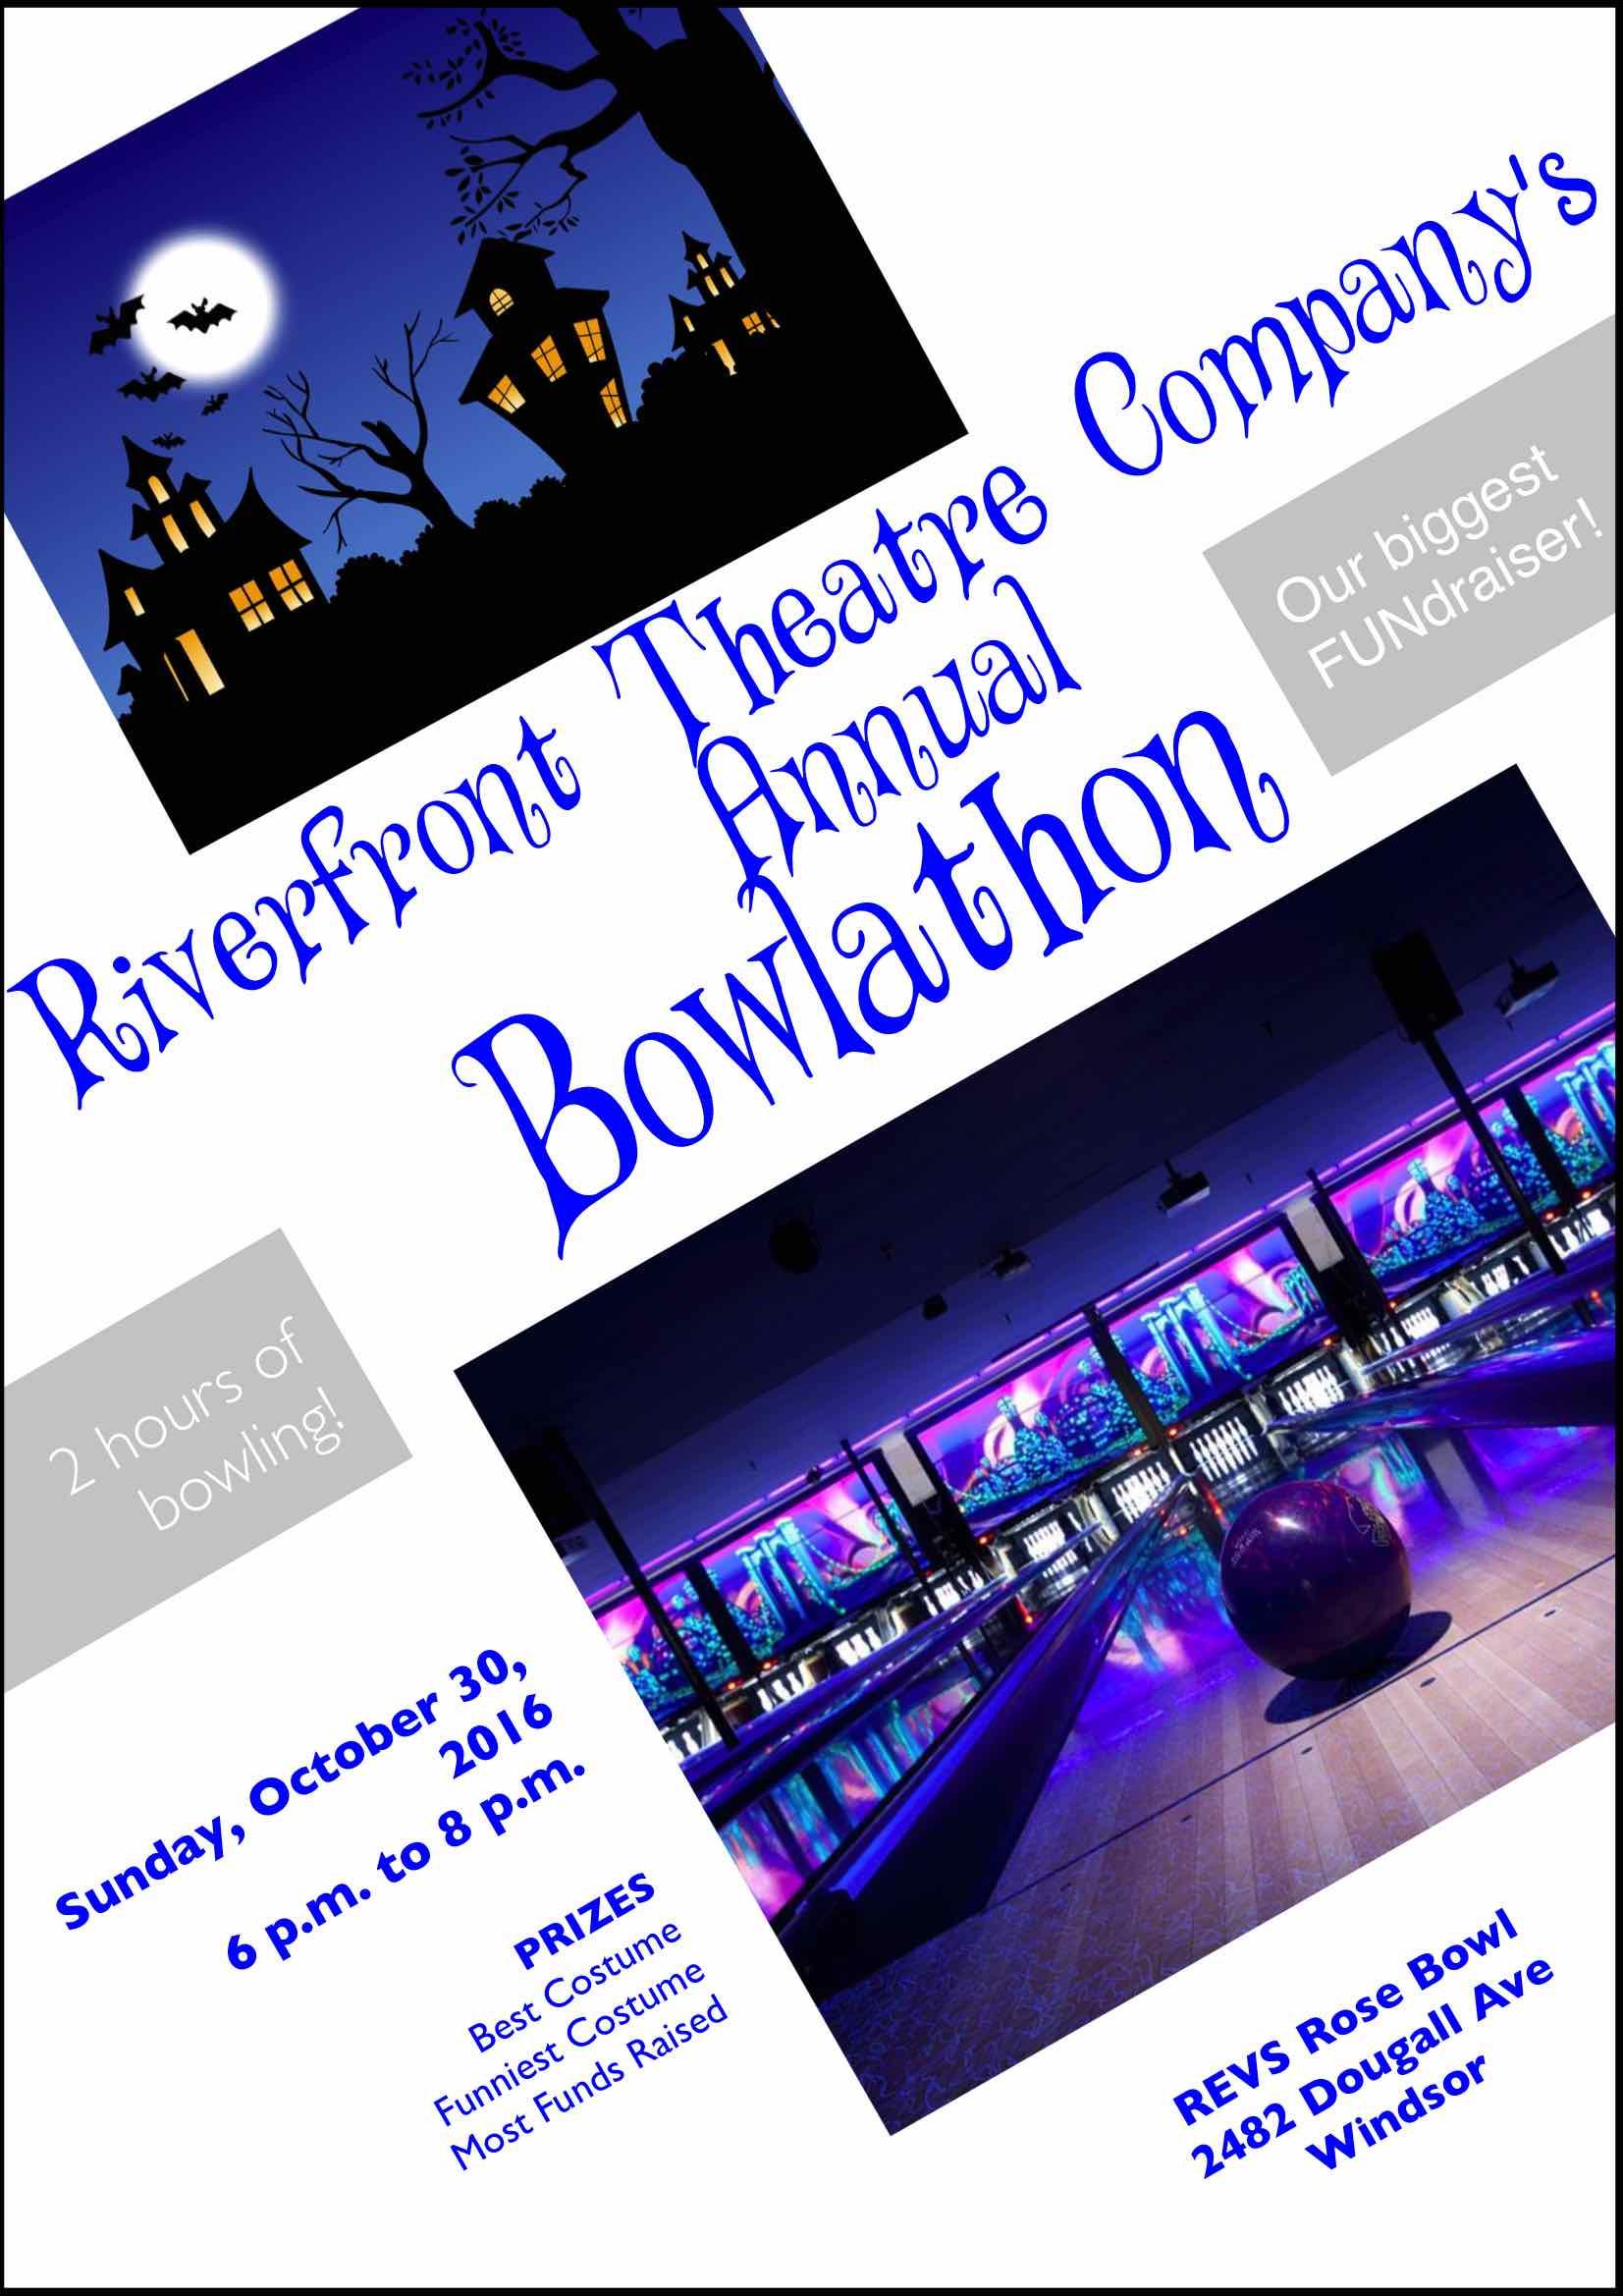 bowlathon-for-fb